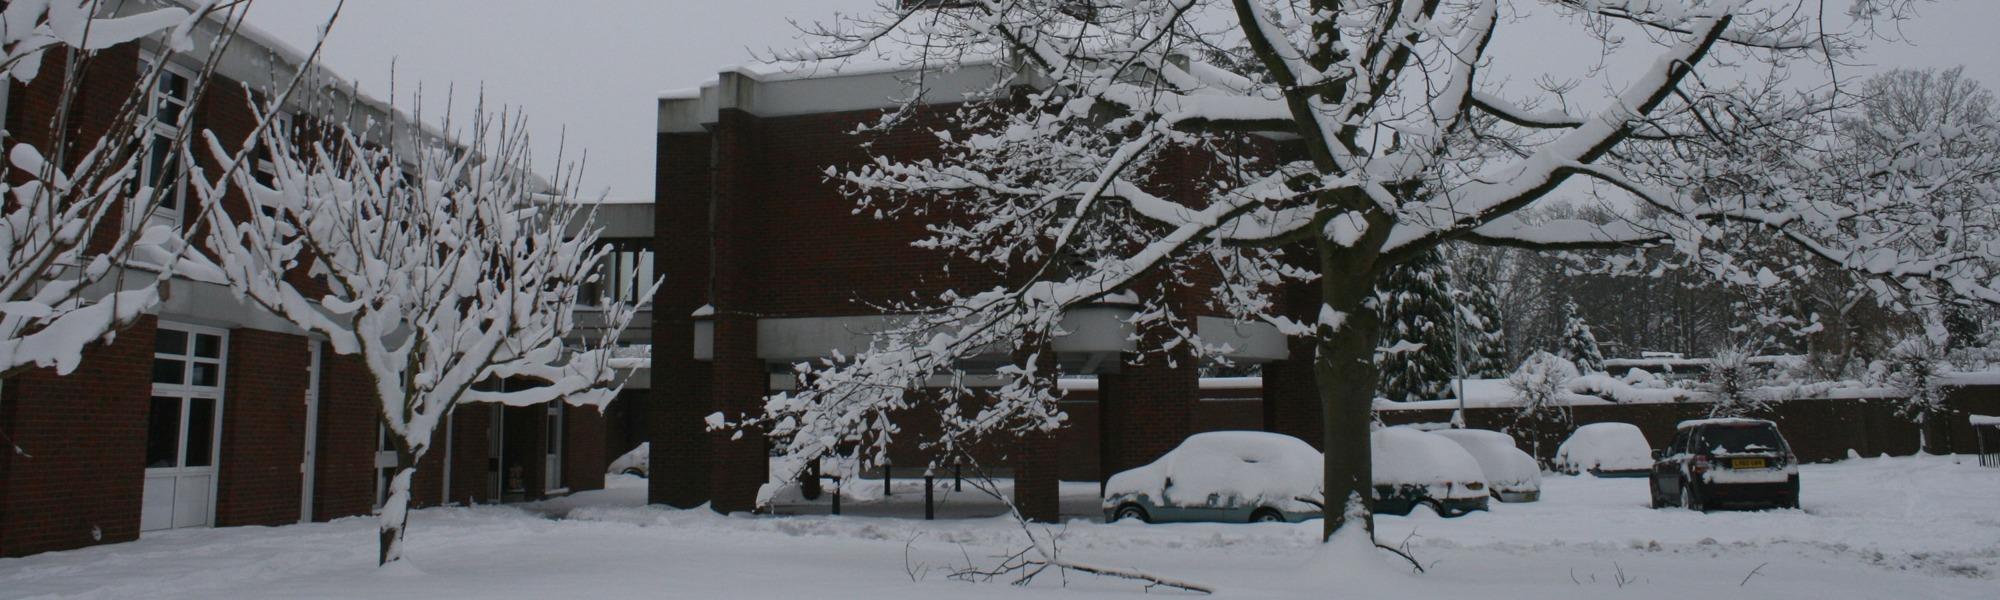 Snow 3rd Dec 2010 062